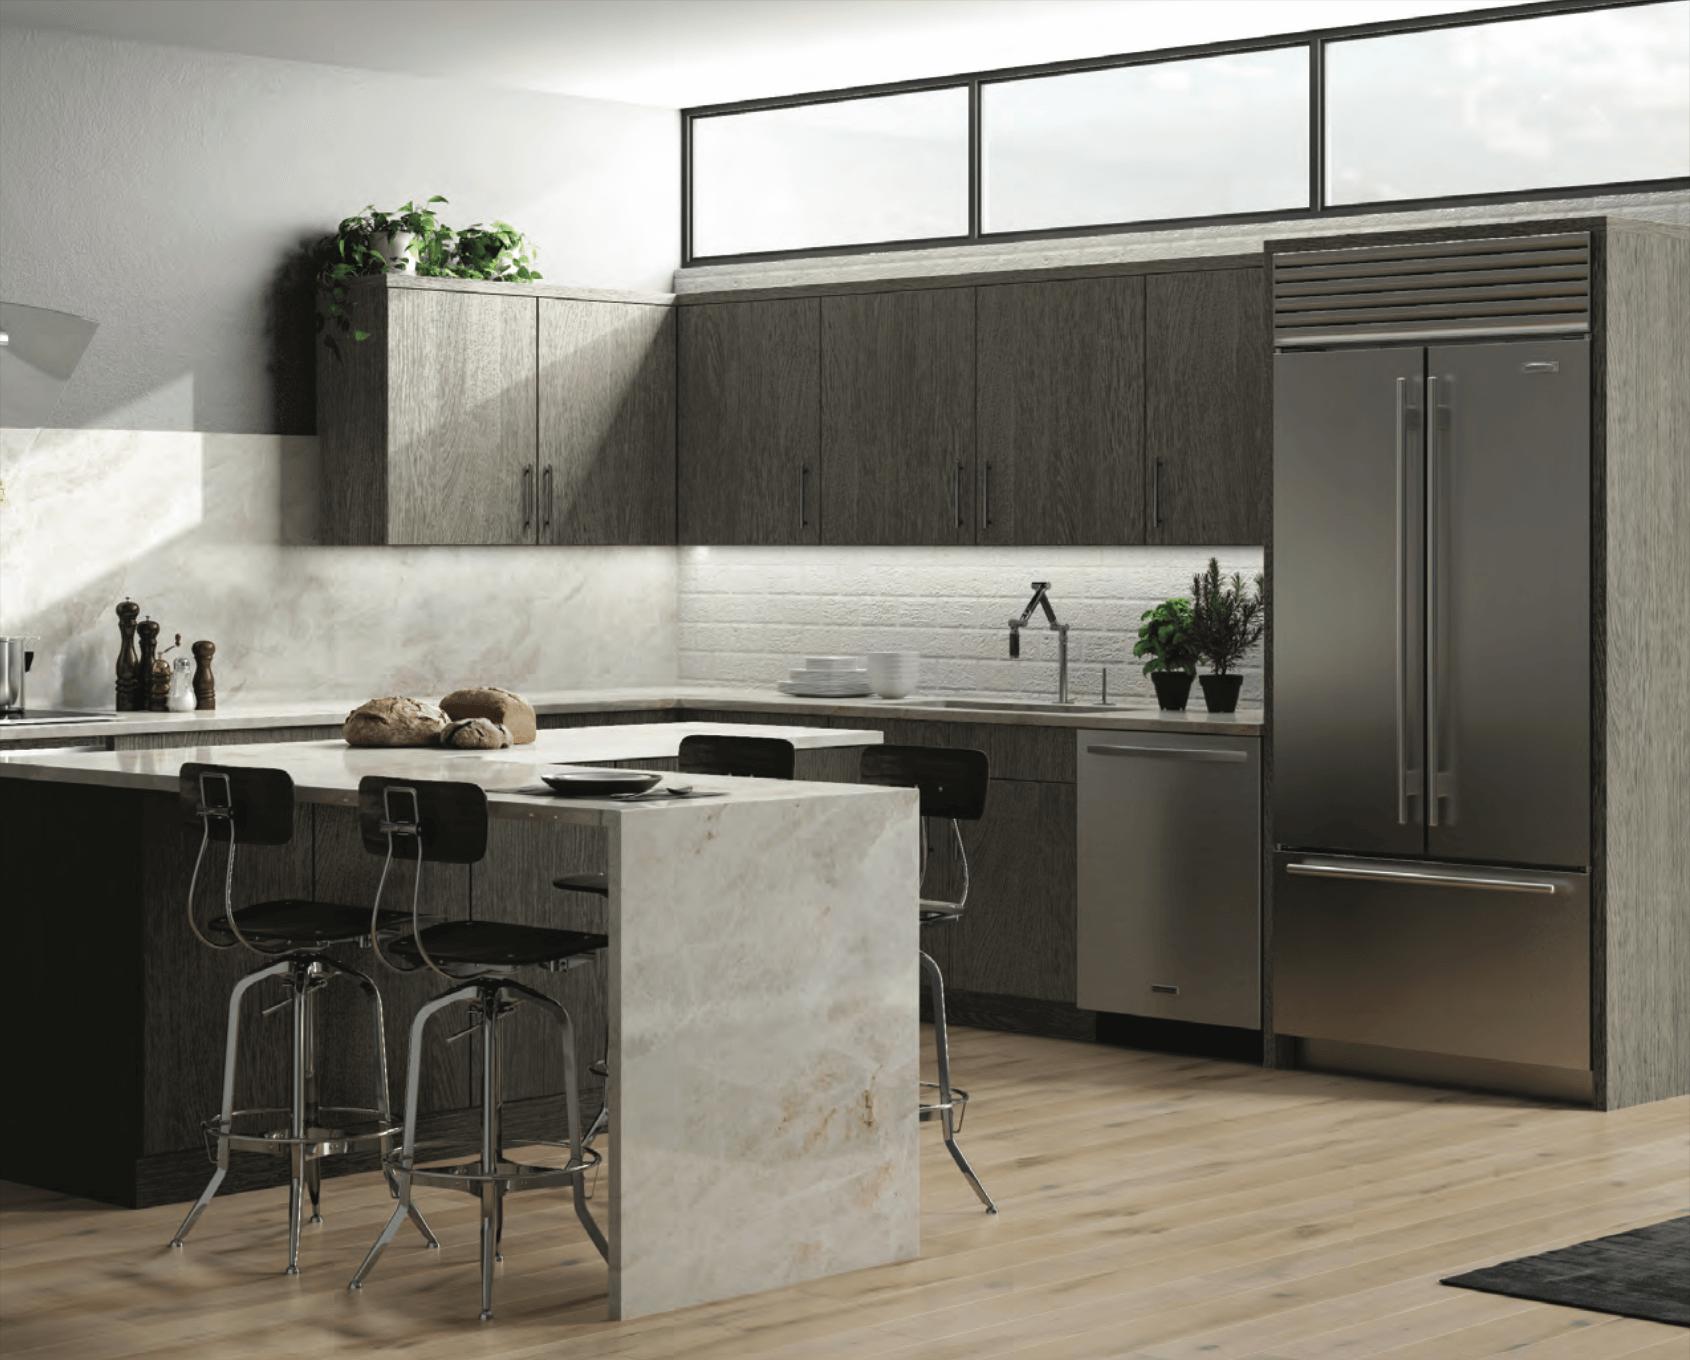 New kitchen featuring CNC Cabinetry Matrix SIlver laminate gray kitchen cabinets